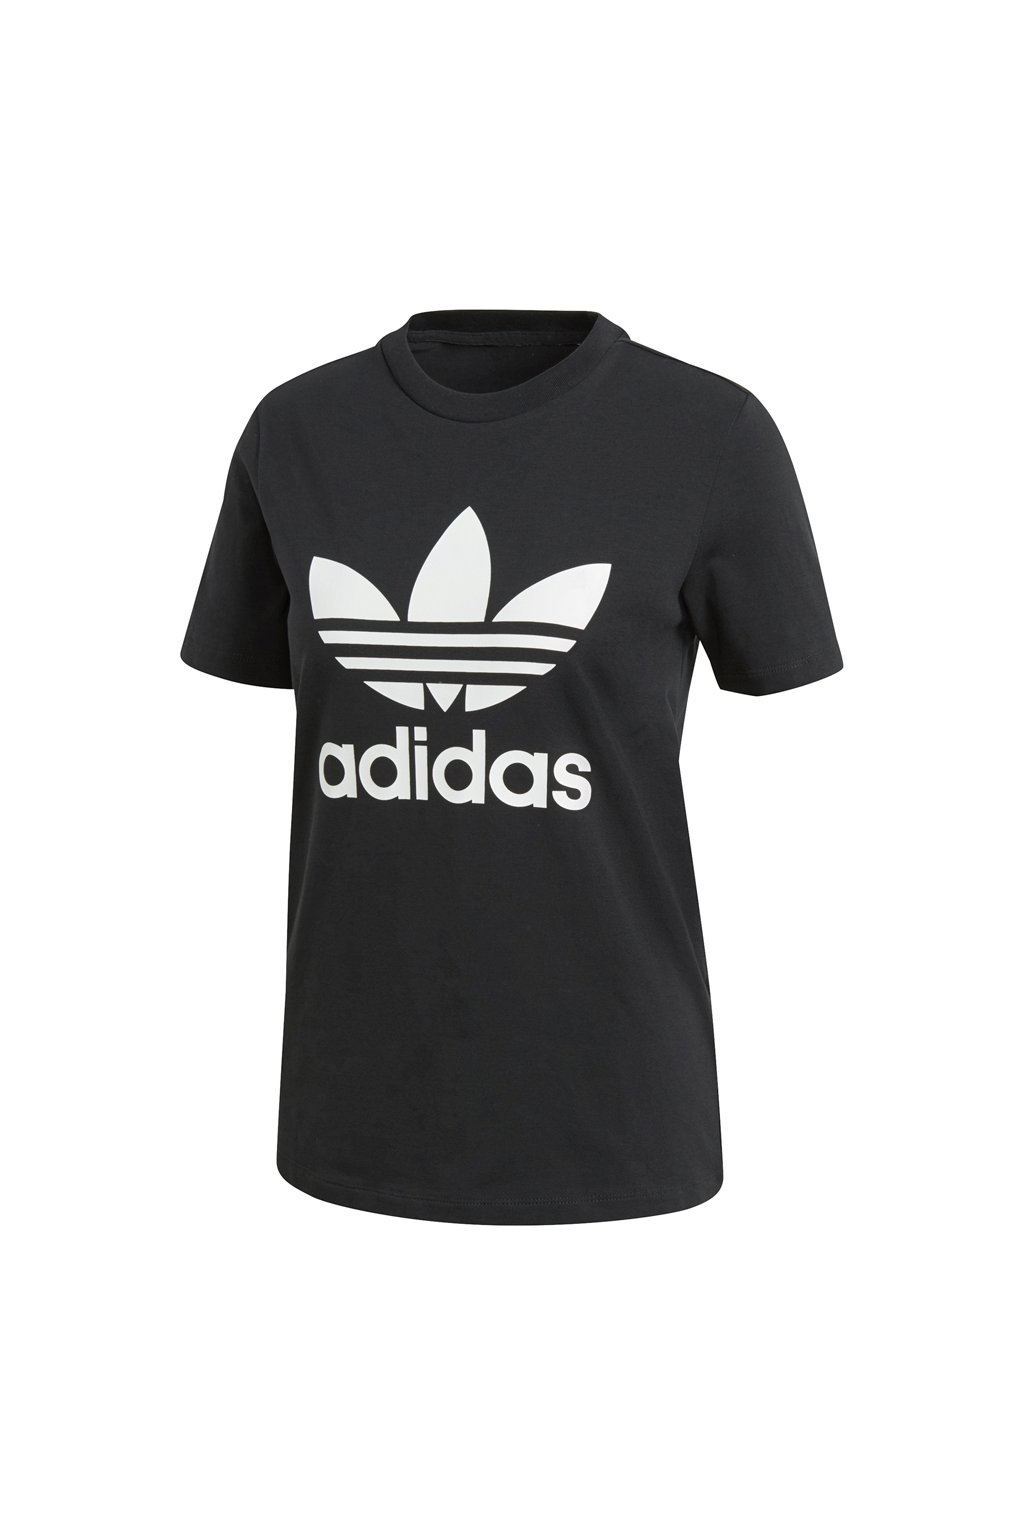 Dámske tričko Adidas Trefoil Tee CV9888 čierne